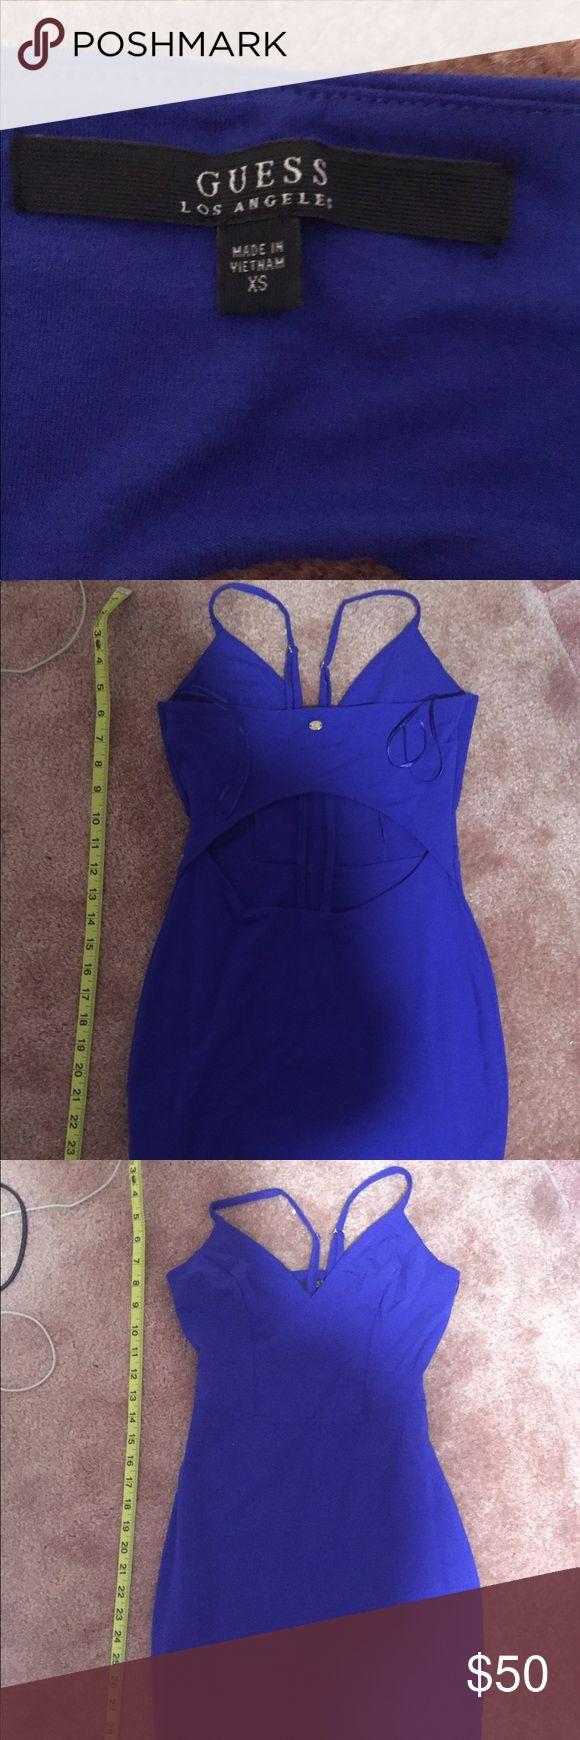 Royal blue Guess dress Cotton. Skin tight. New. GUESS dress. XS Guess Dresses